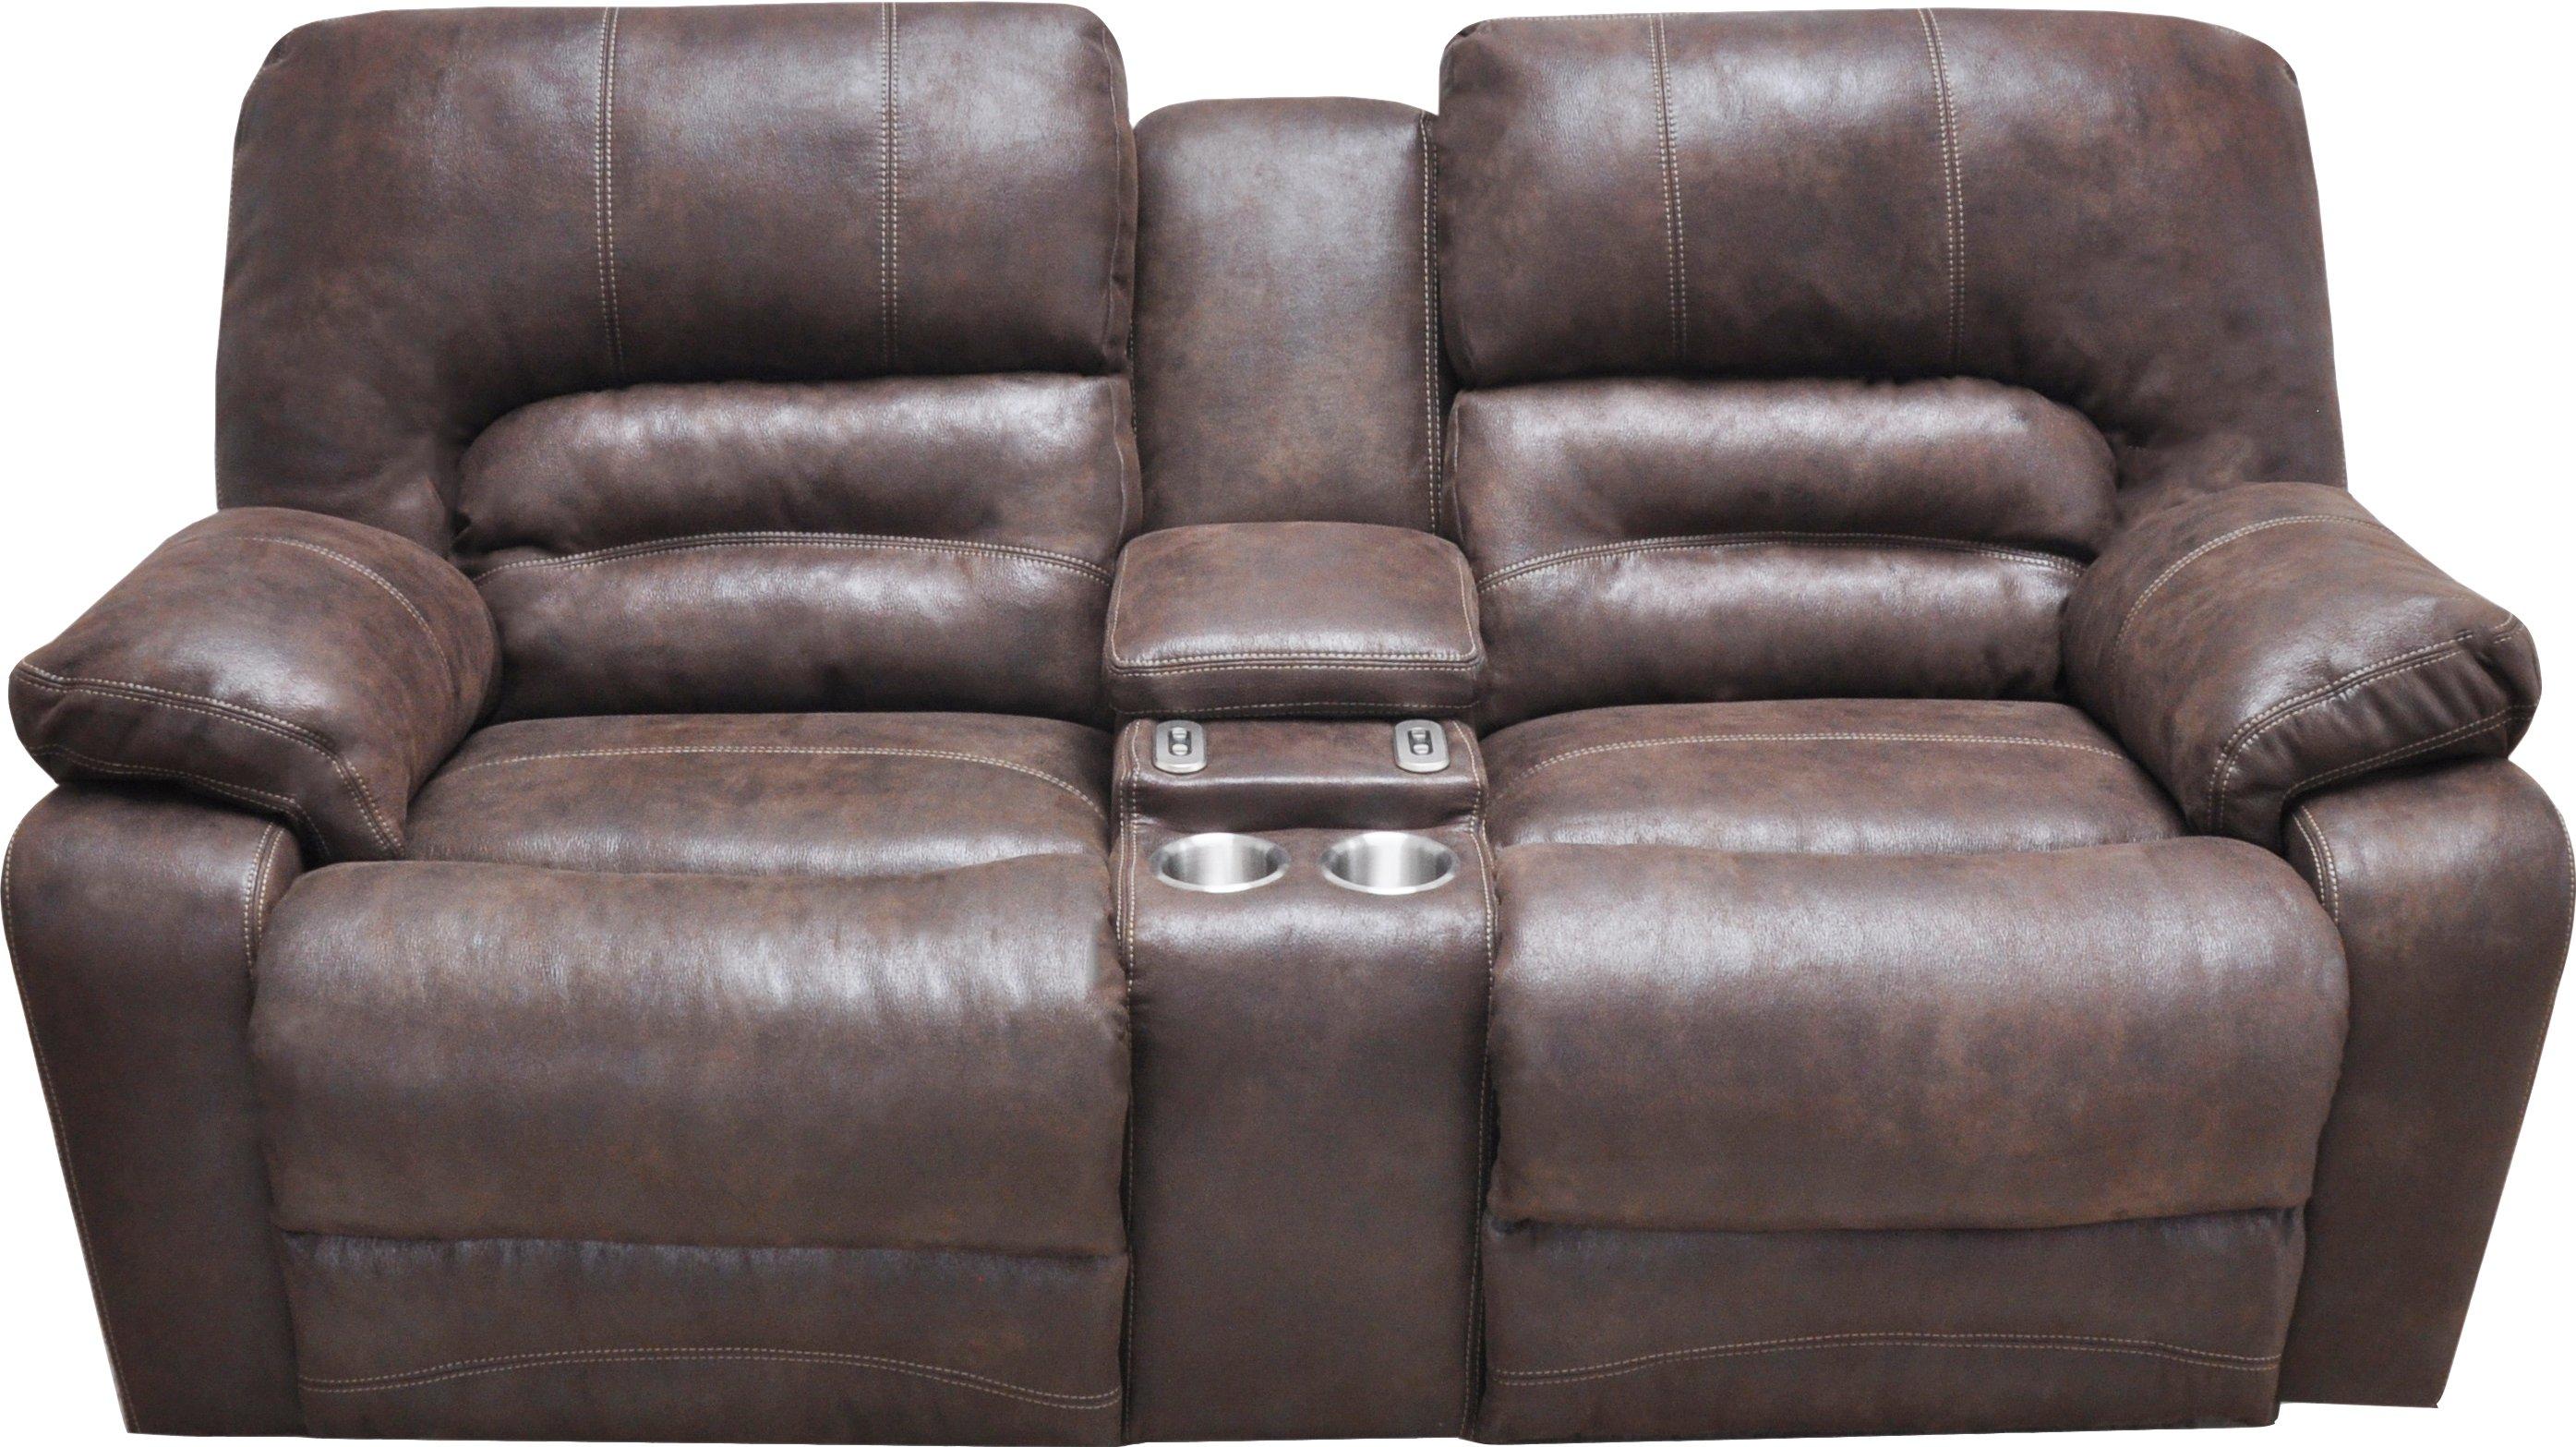 Chocolate Brown Microfiber Power Reclining Sofa Amp Loveseat